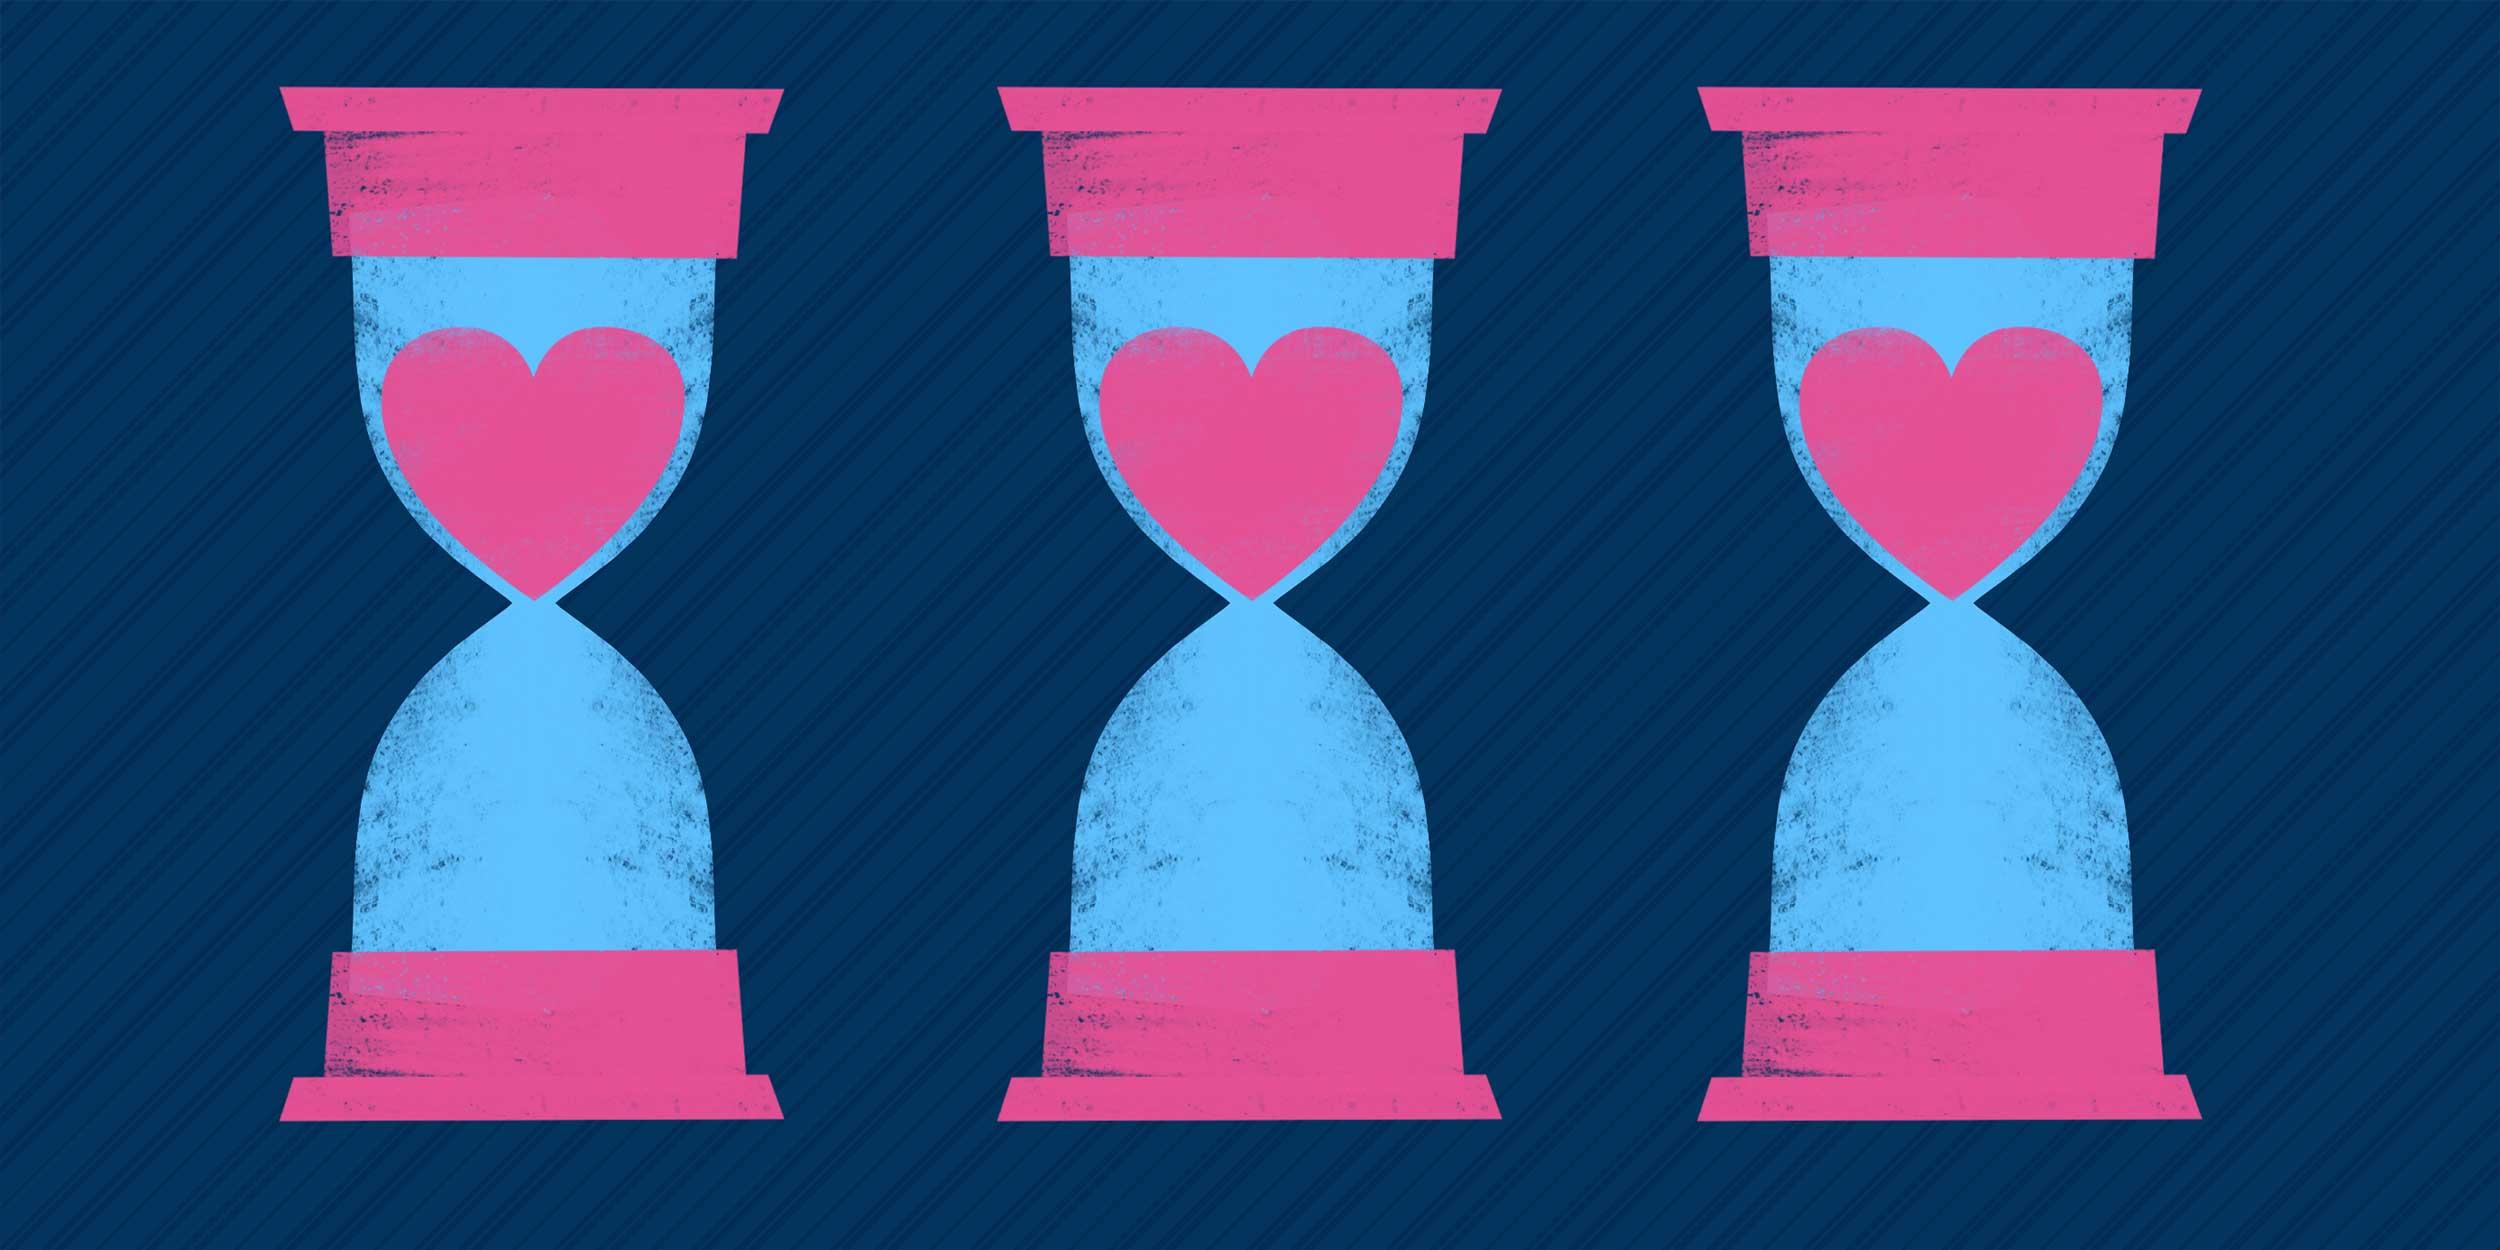 как достичь оргазма без секса